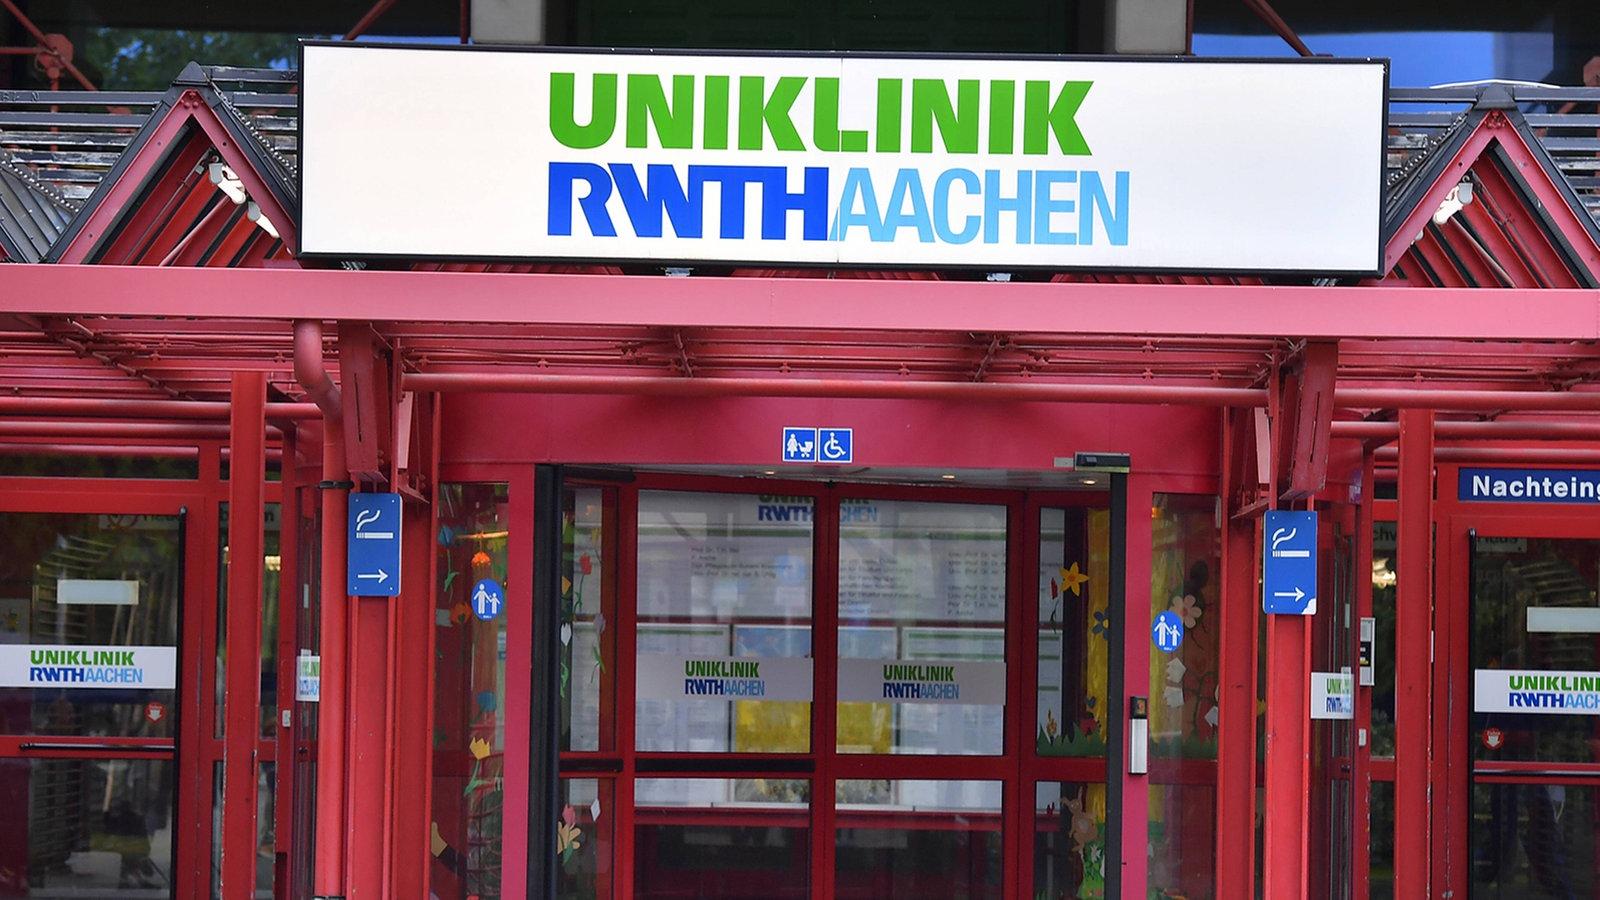 Wdr Mediathek Aachen